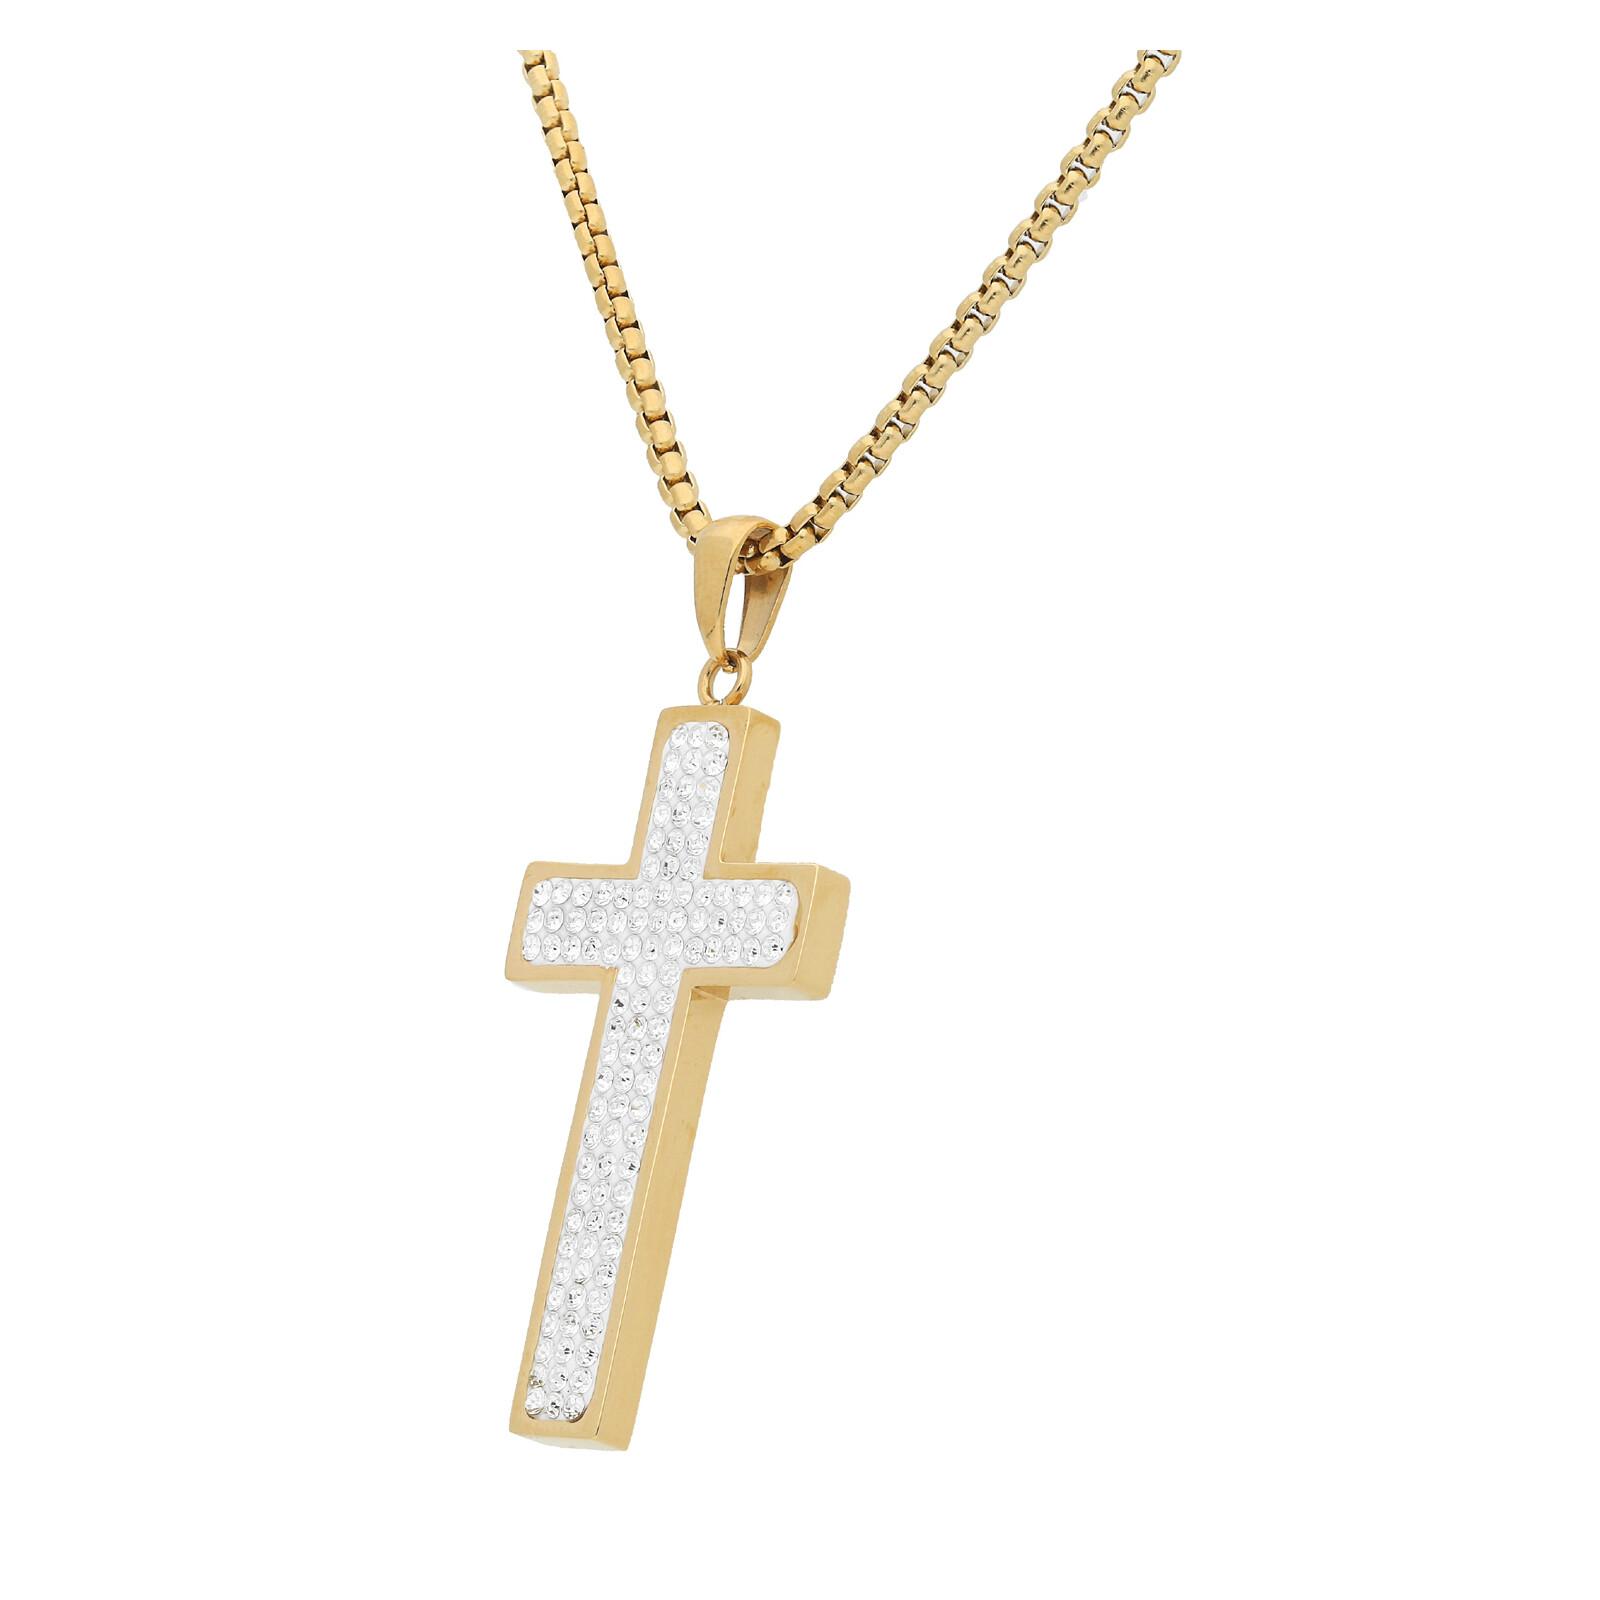 Edelstahlkette Kreuz Kristalle goldfarben